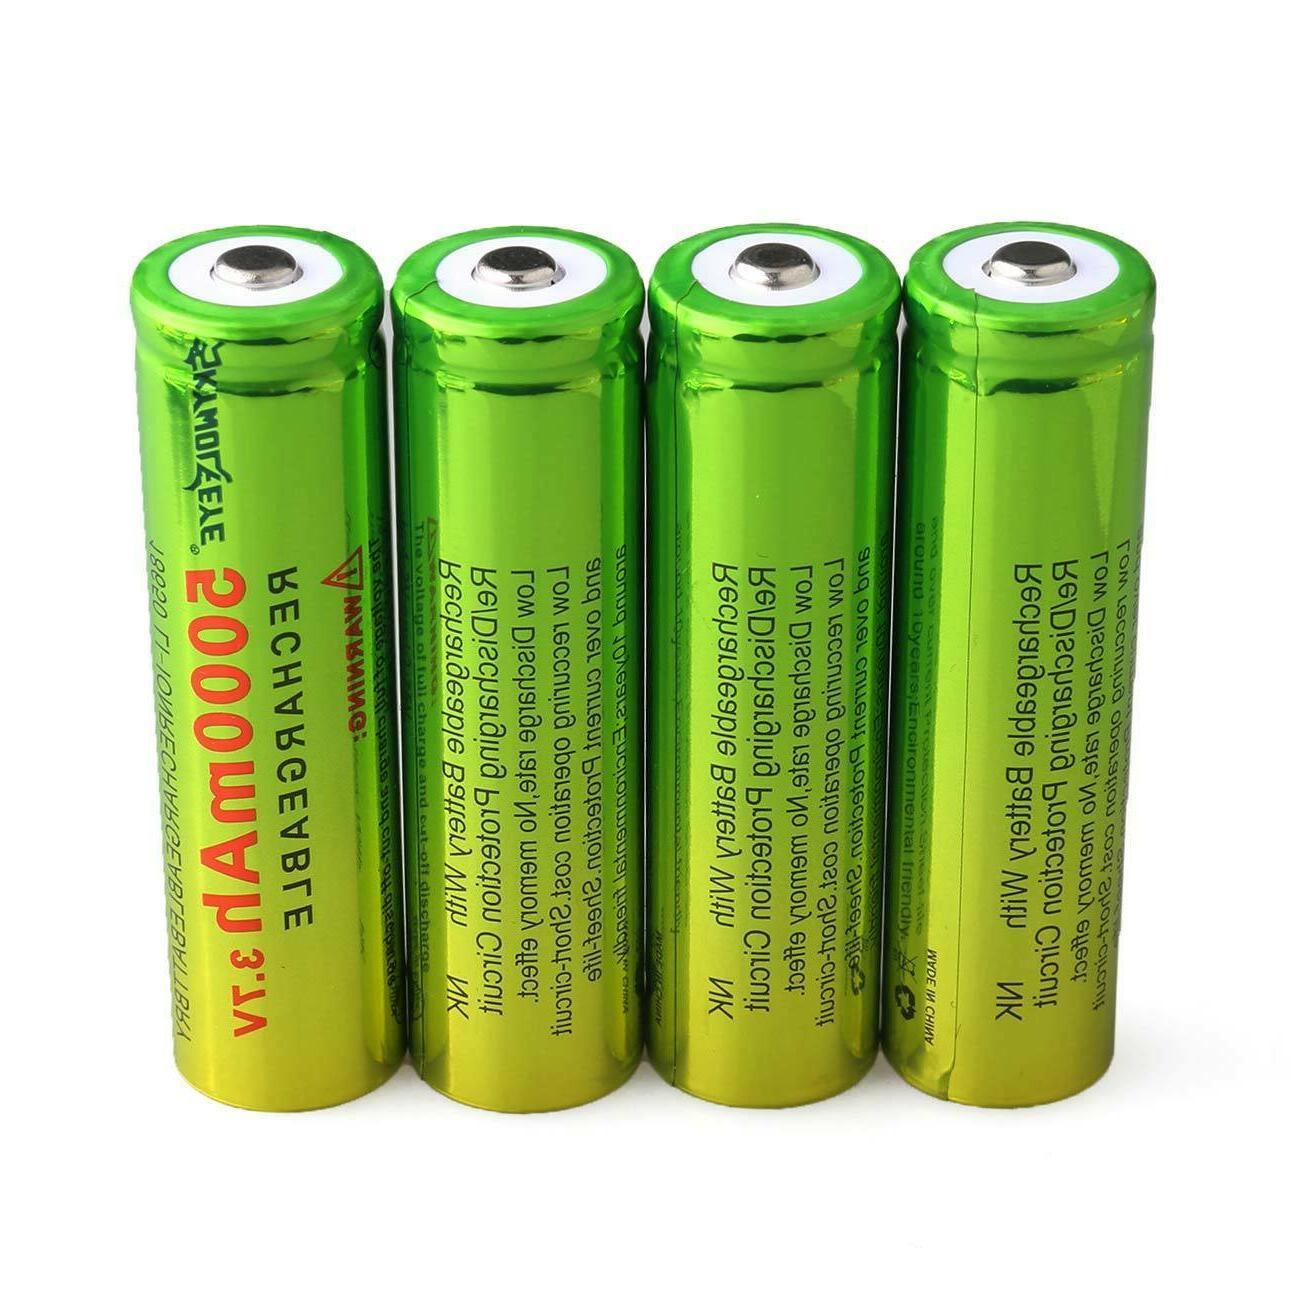 Lot 3.7V 18650 Battery 5000mAh Li-ion Rechargeable Batteries USA